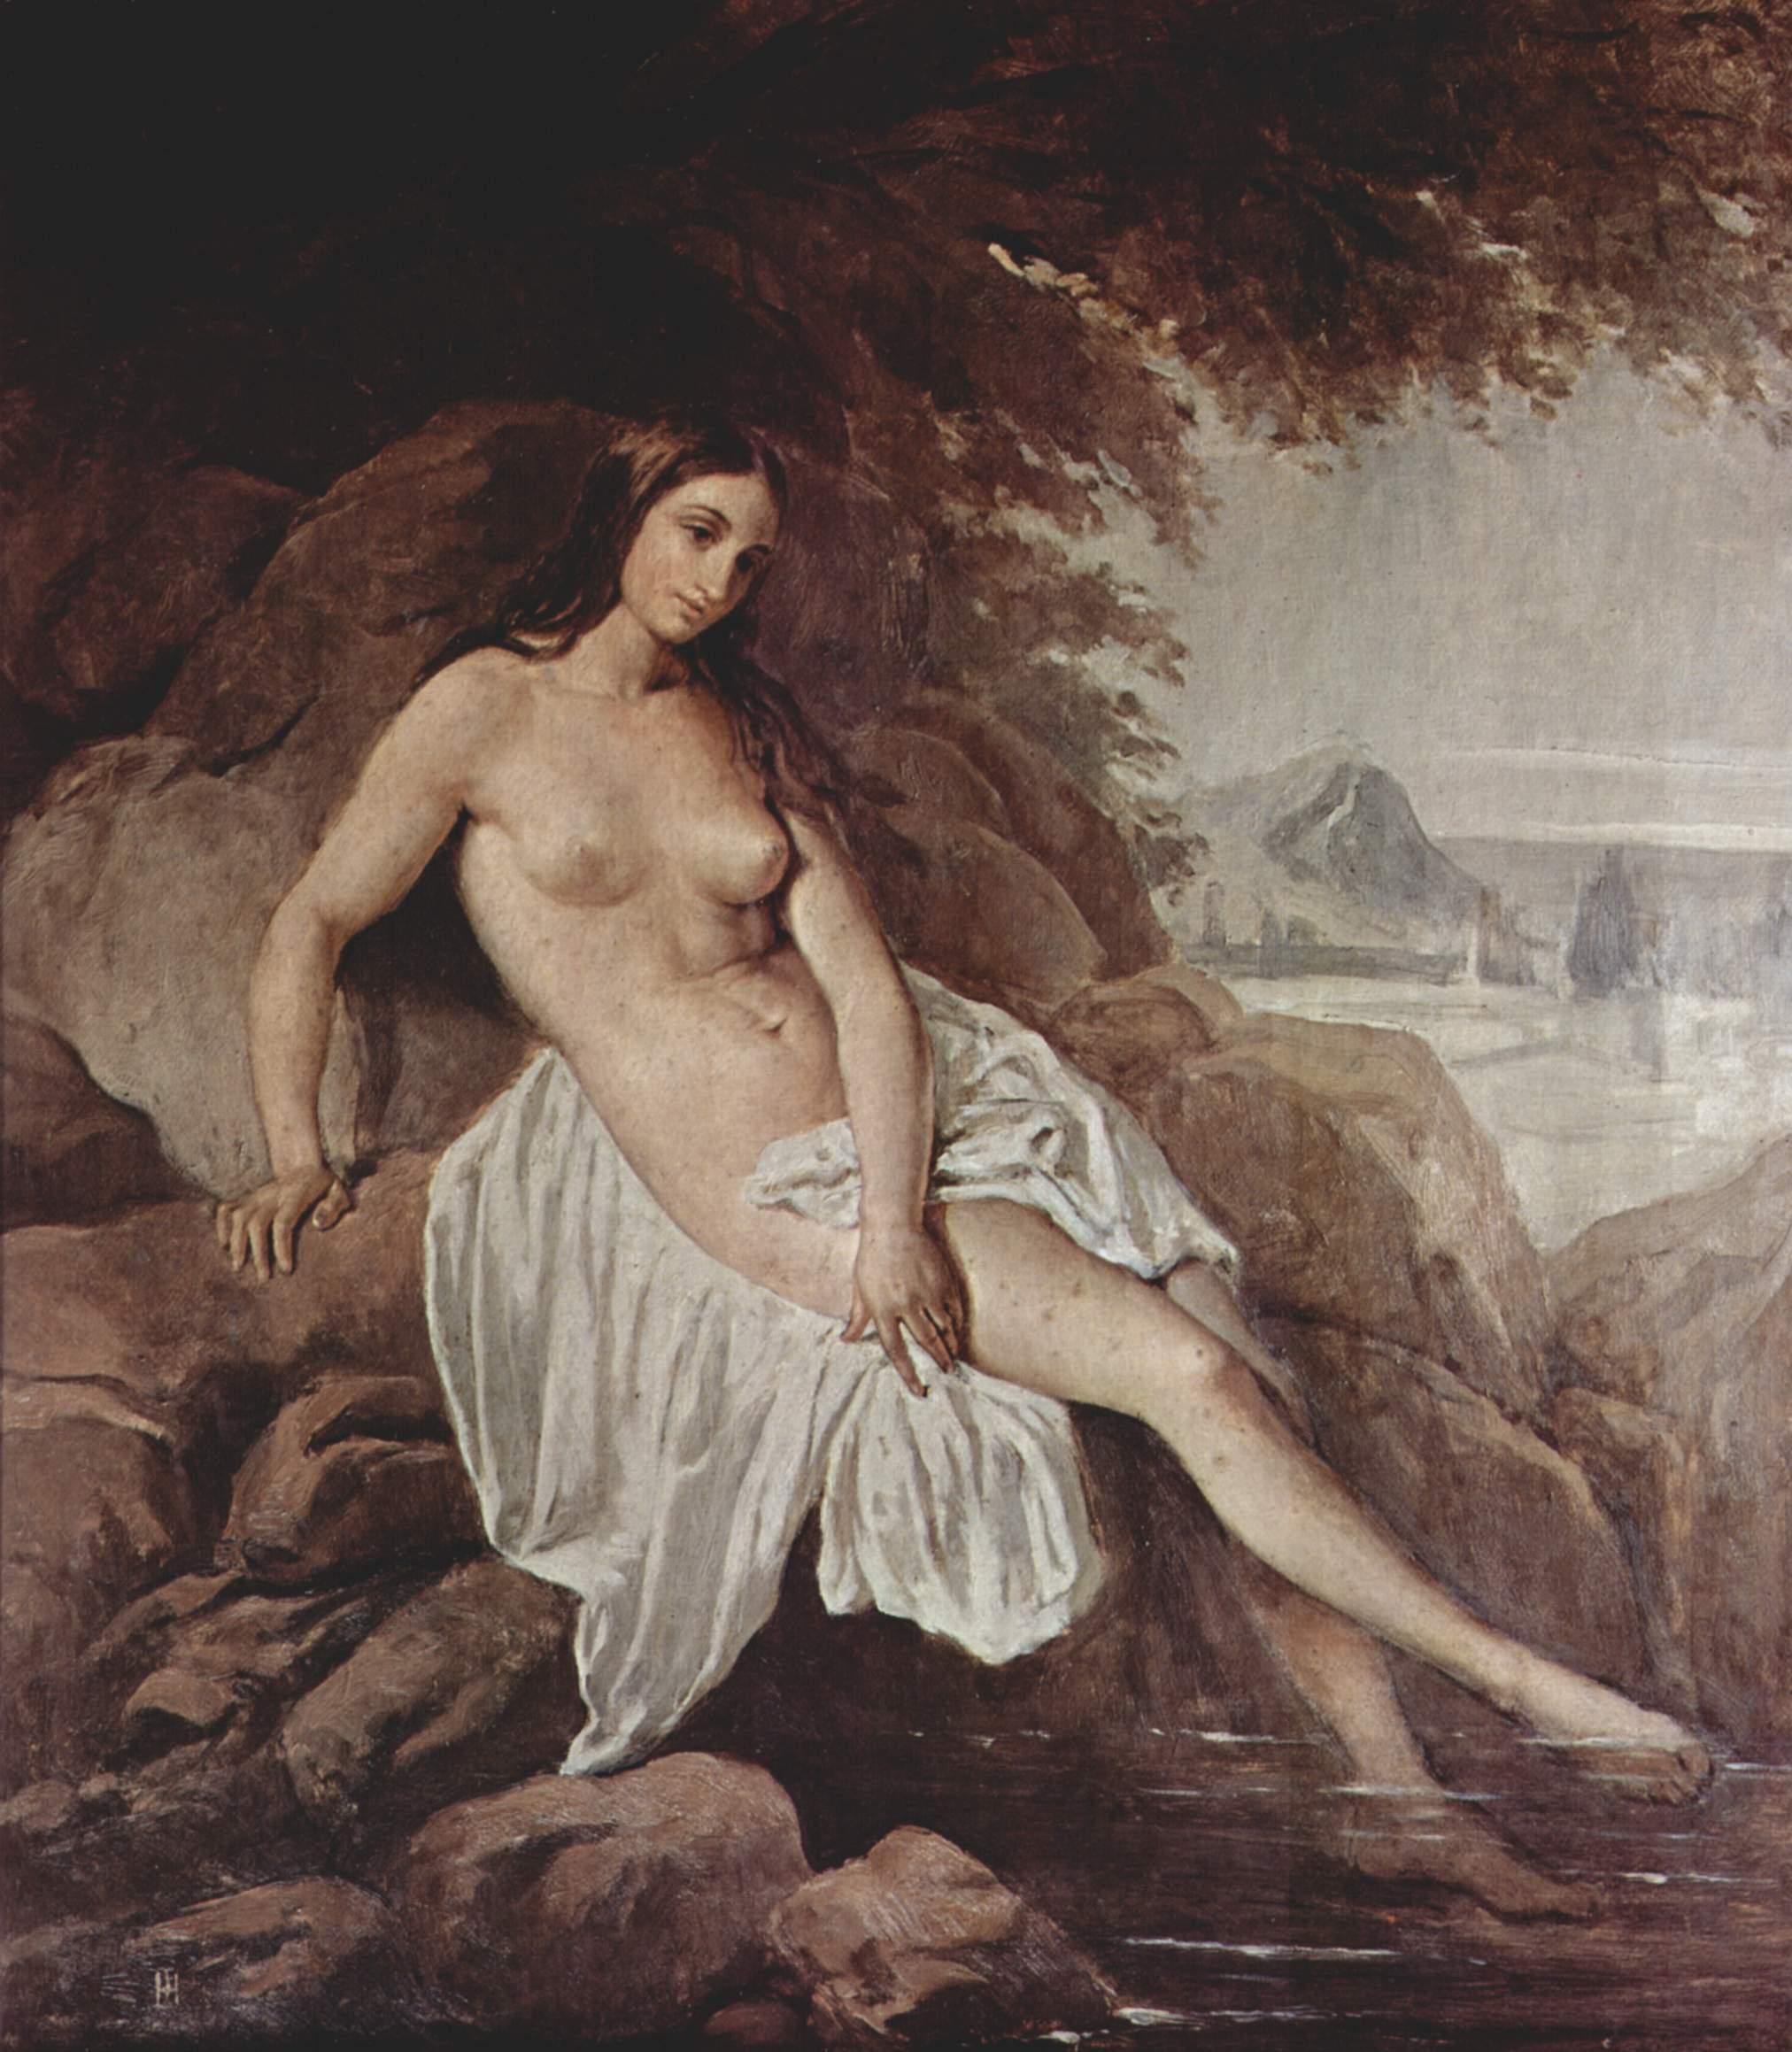 http://uploads7.wikipaintings.org/images/francesco-hayez/badende-1832.jpg